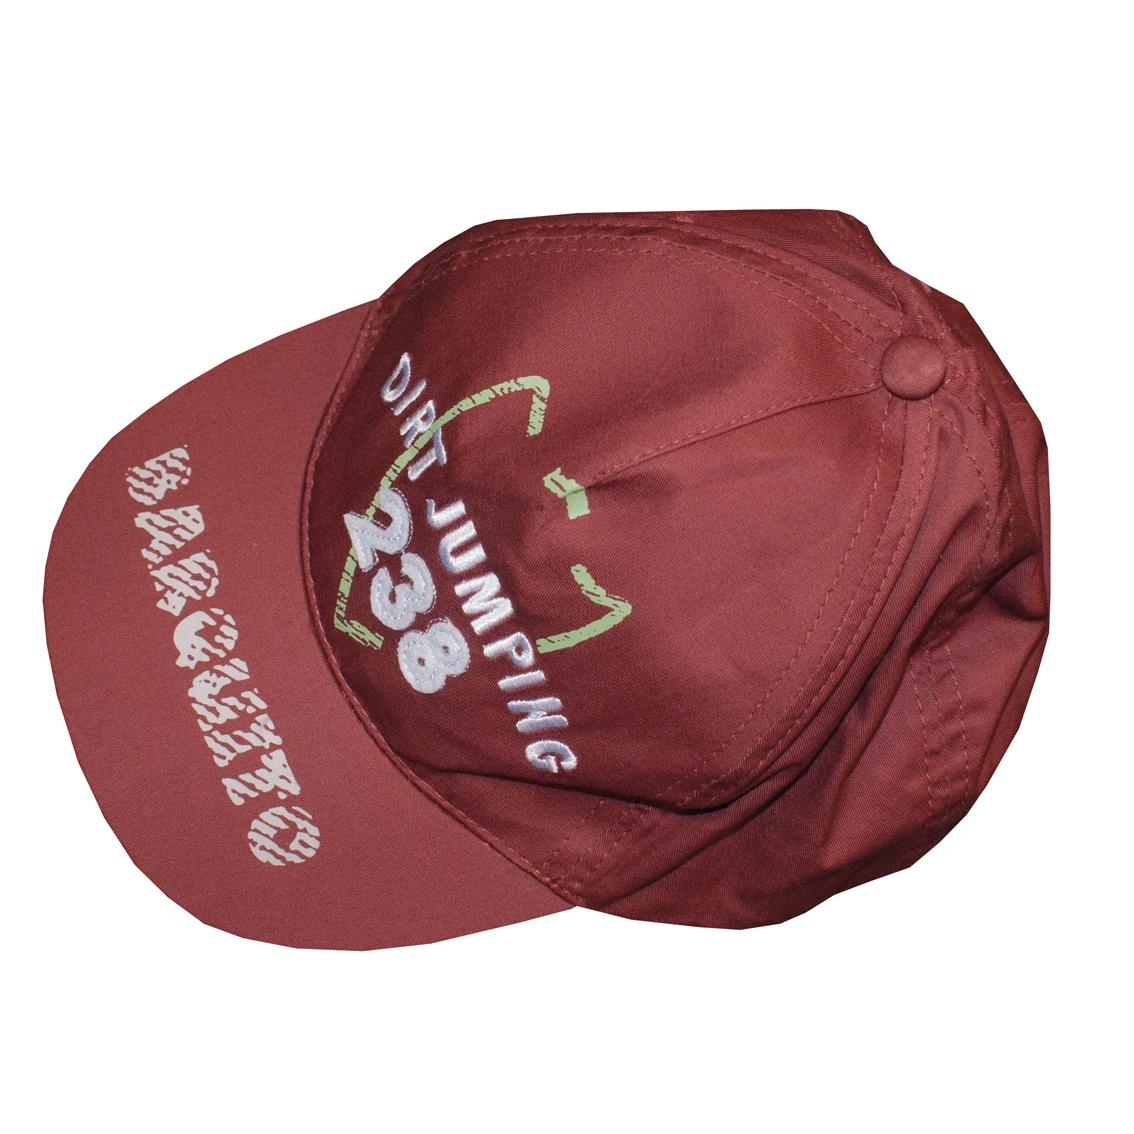 Кепка для мальчика BARQUITO Спорт головные уборы barquito кепка для девочки спорт barquito синяя